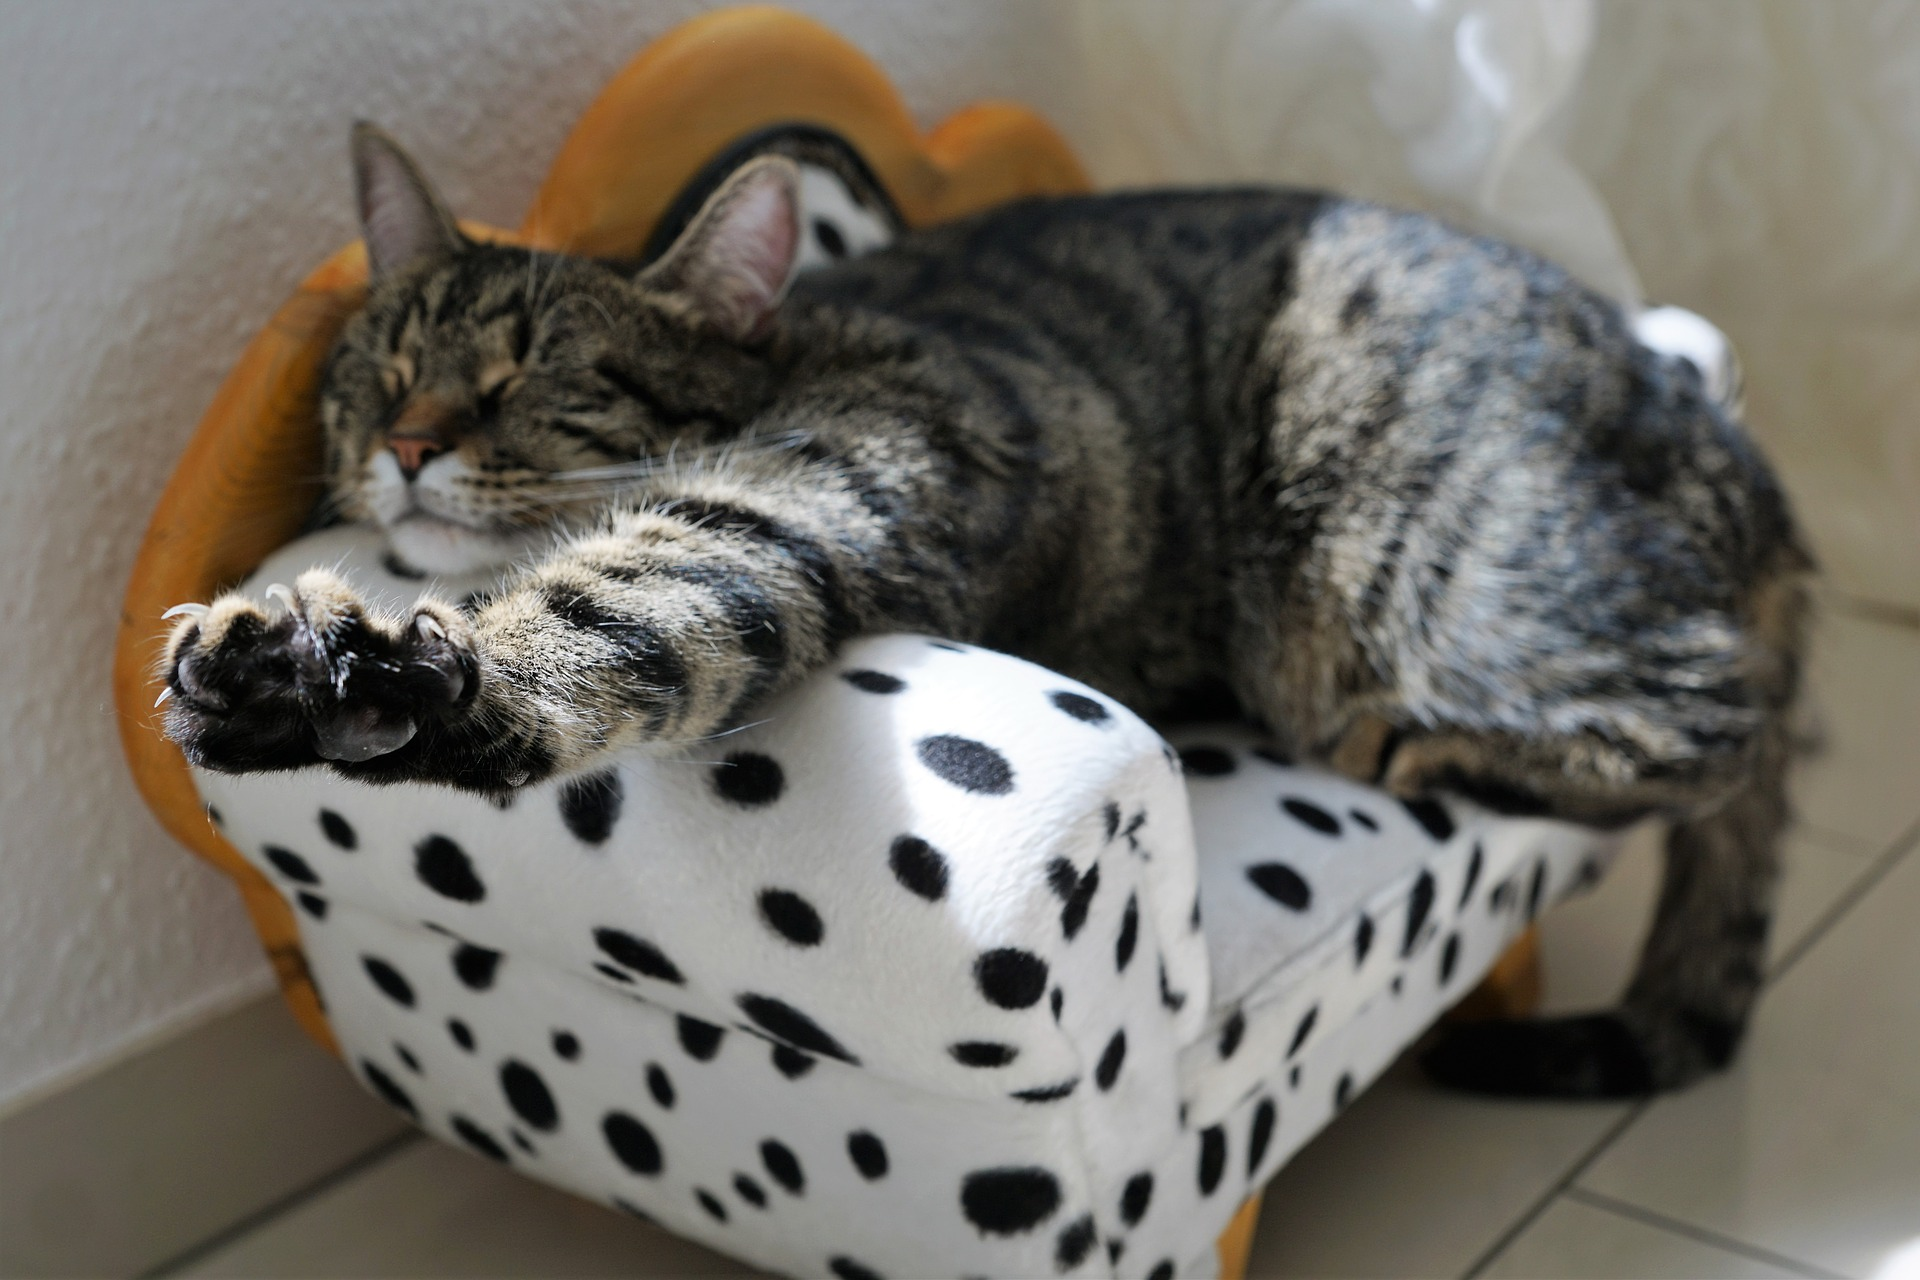 cat-2360863_1920.jpg